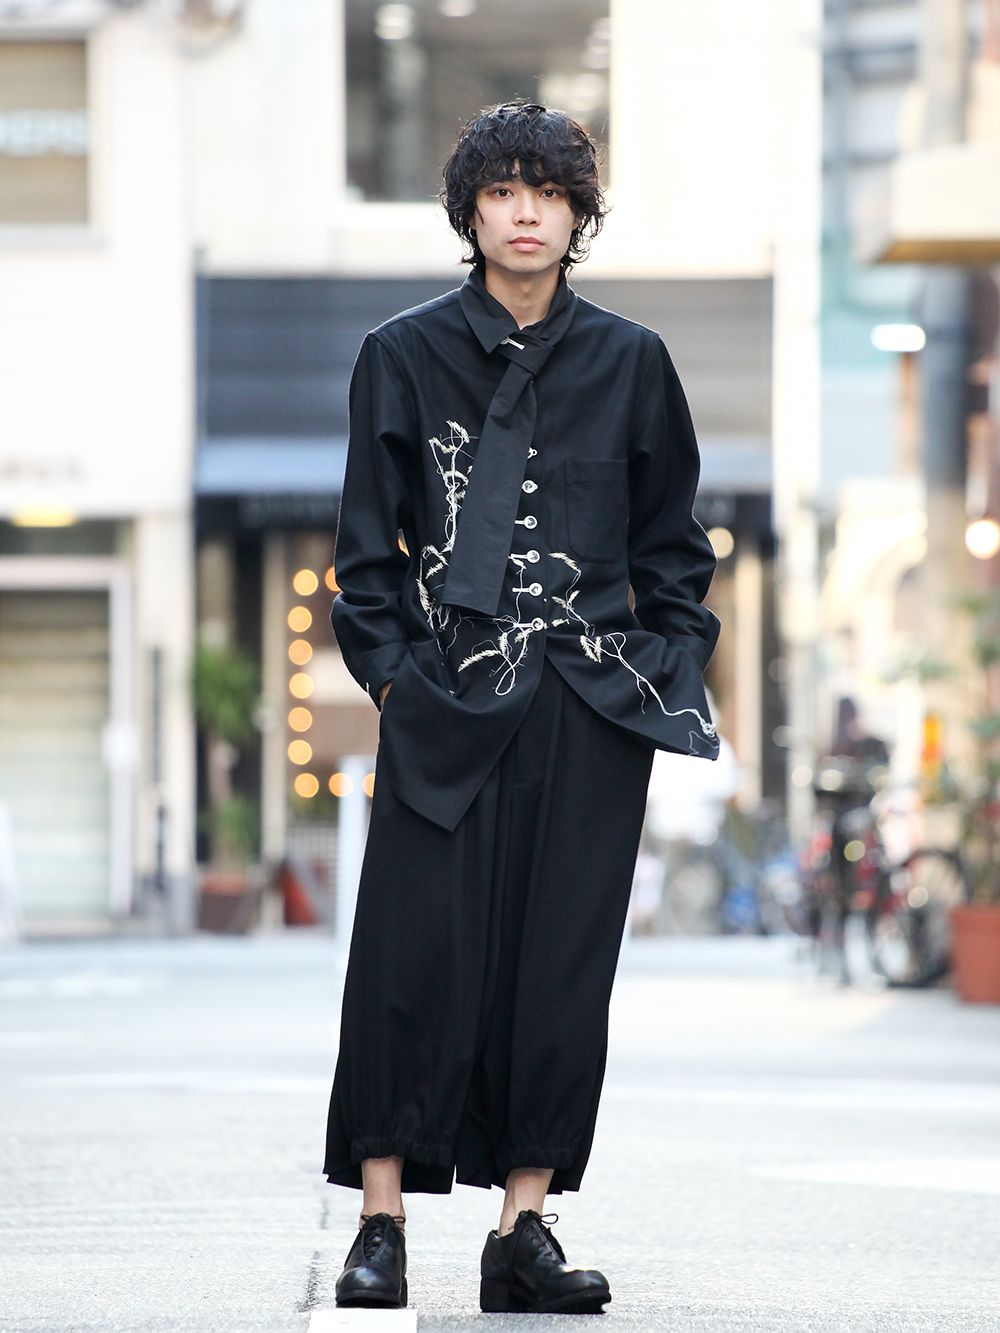 Yohji Yamamoto 19-20AW collection New Arrivals!! - 1-001